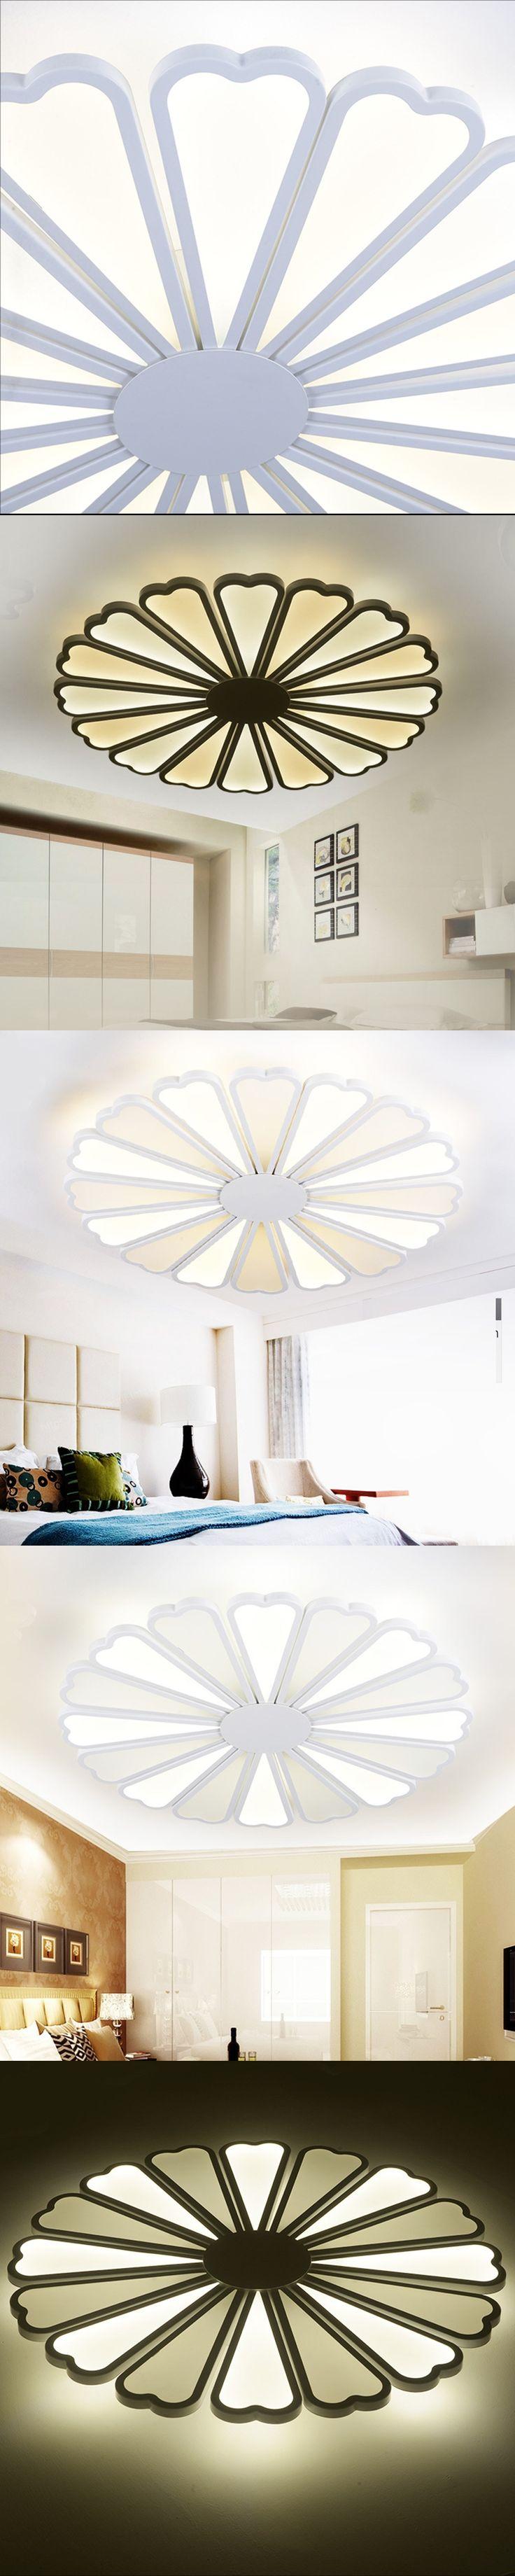 acrylic ceiling lights 160w led living room lamp modern lamparas de techo luminaire deckenleuchten ceiling lighting fixtures